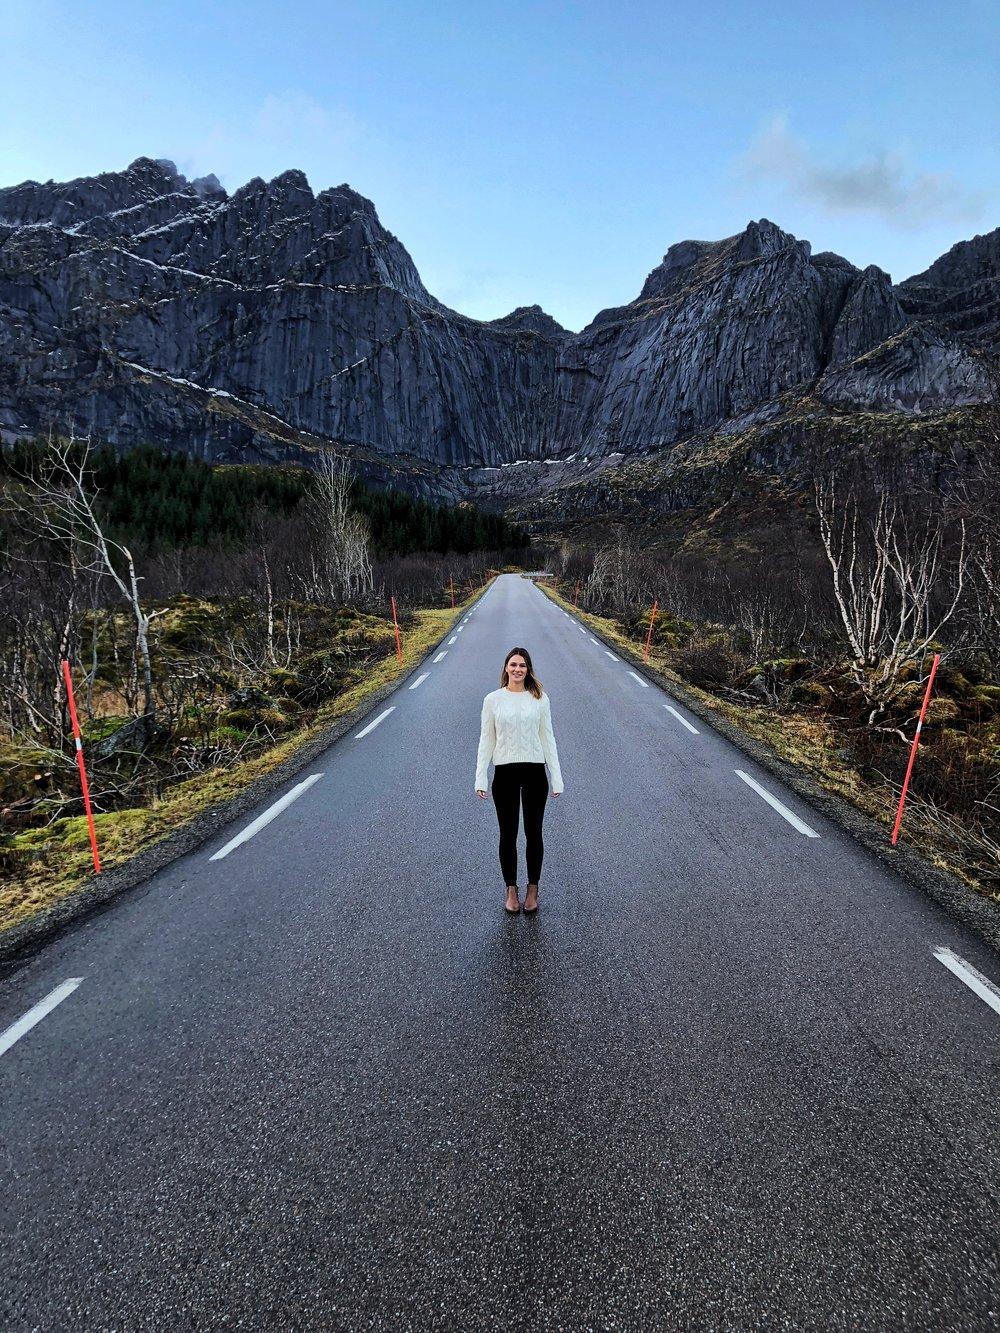 Nusfjord Lofoten Islands